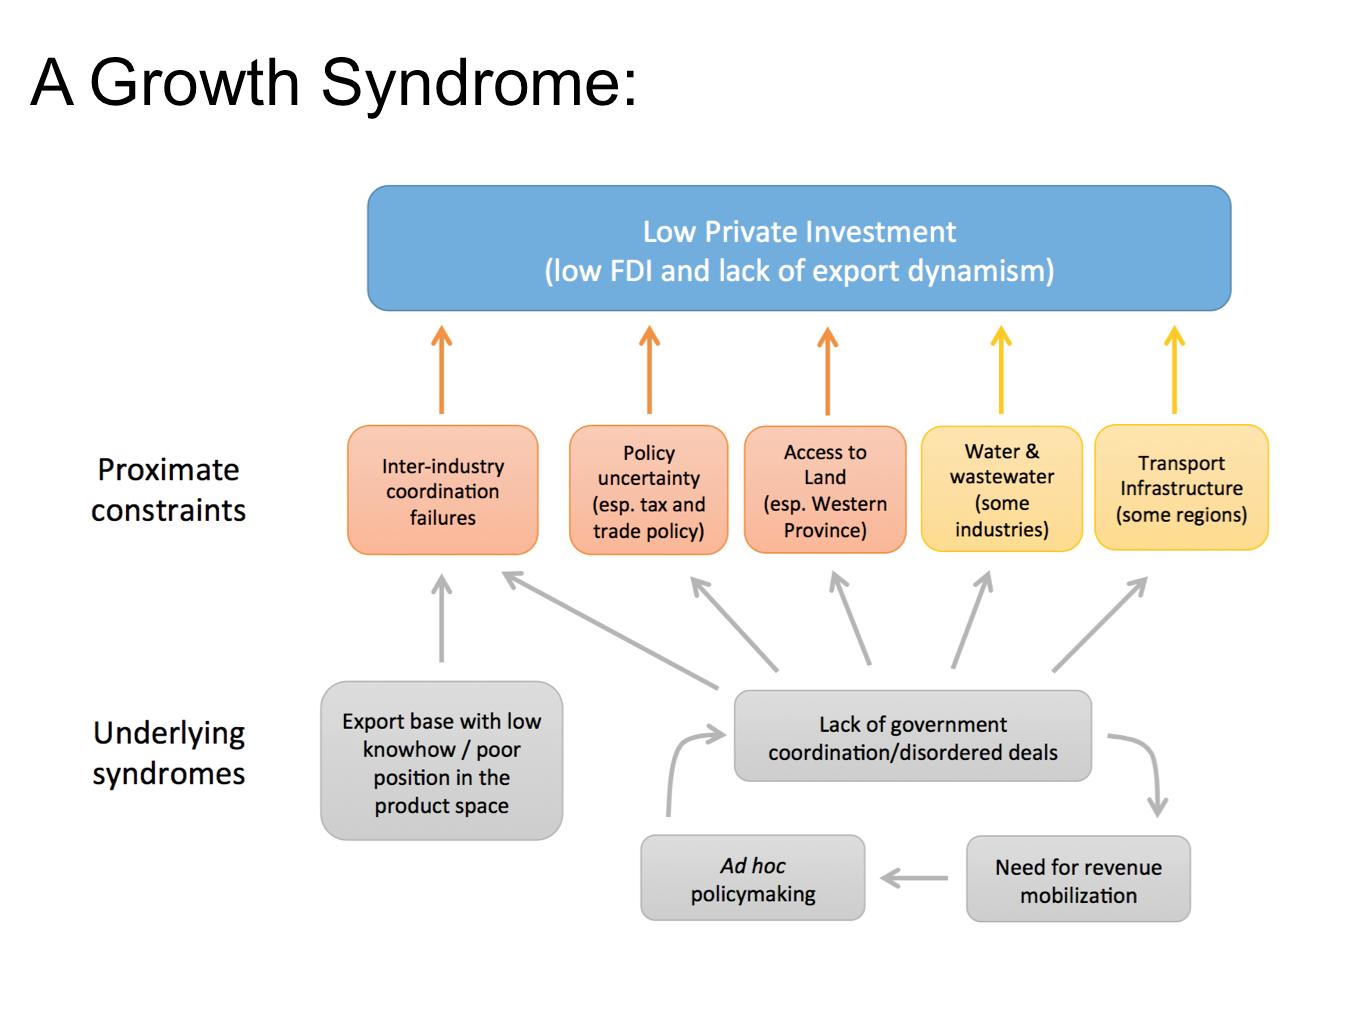 Sri Lanka Growth Syndrome